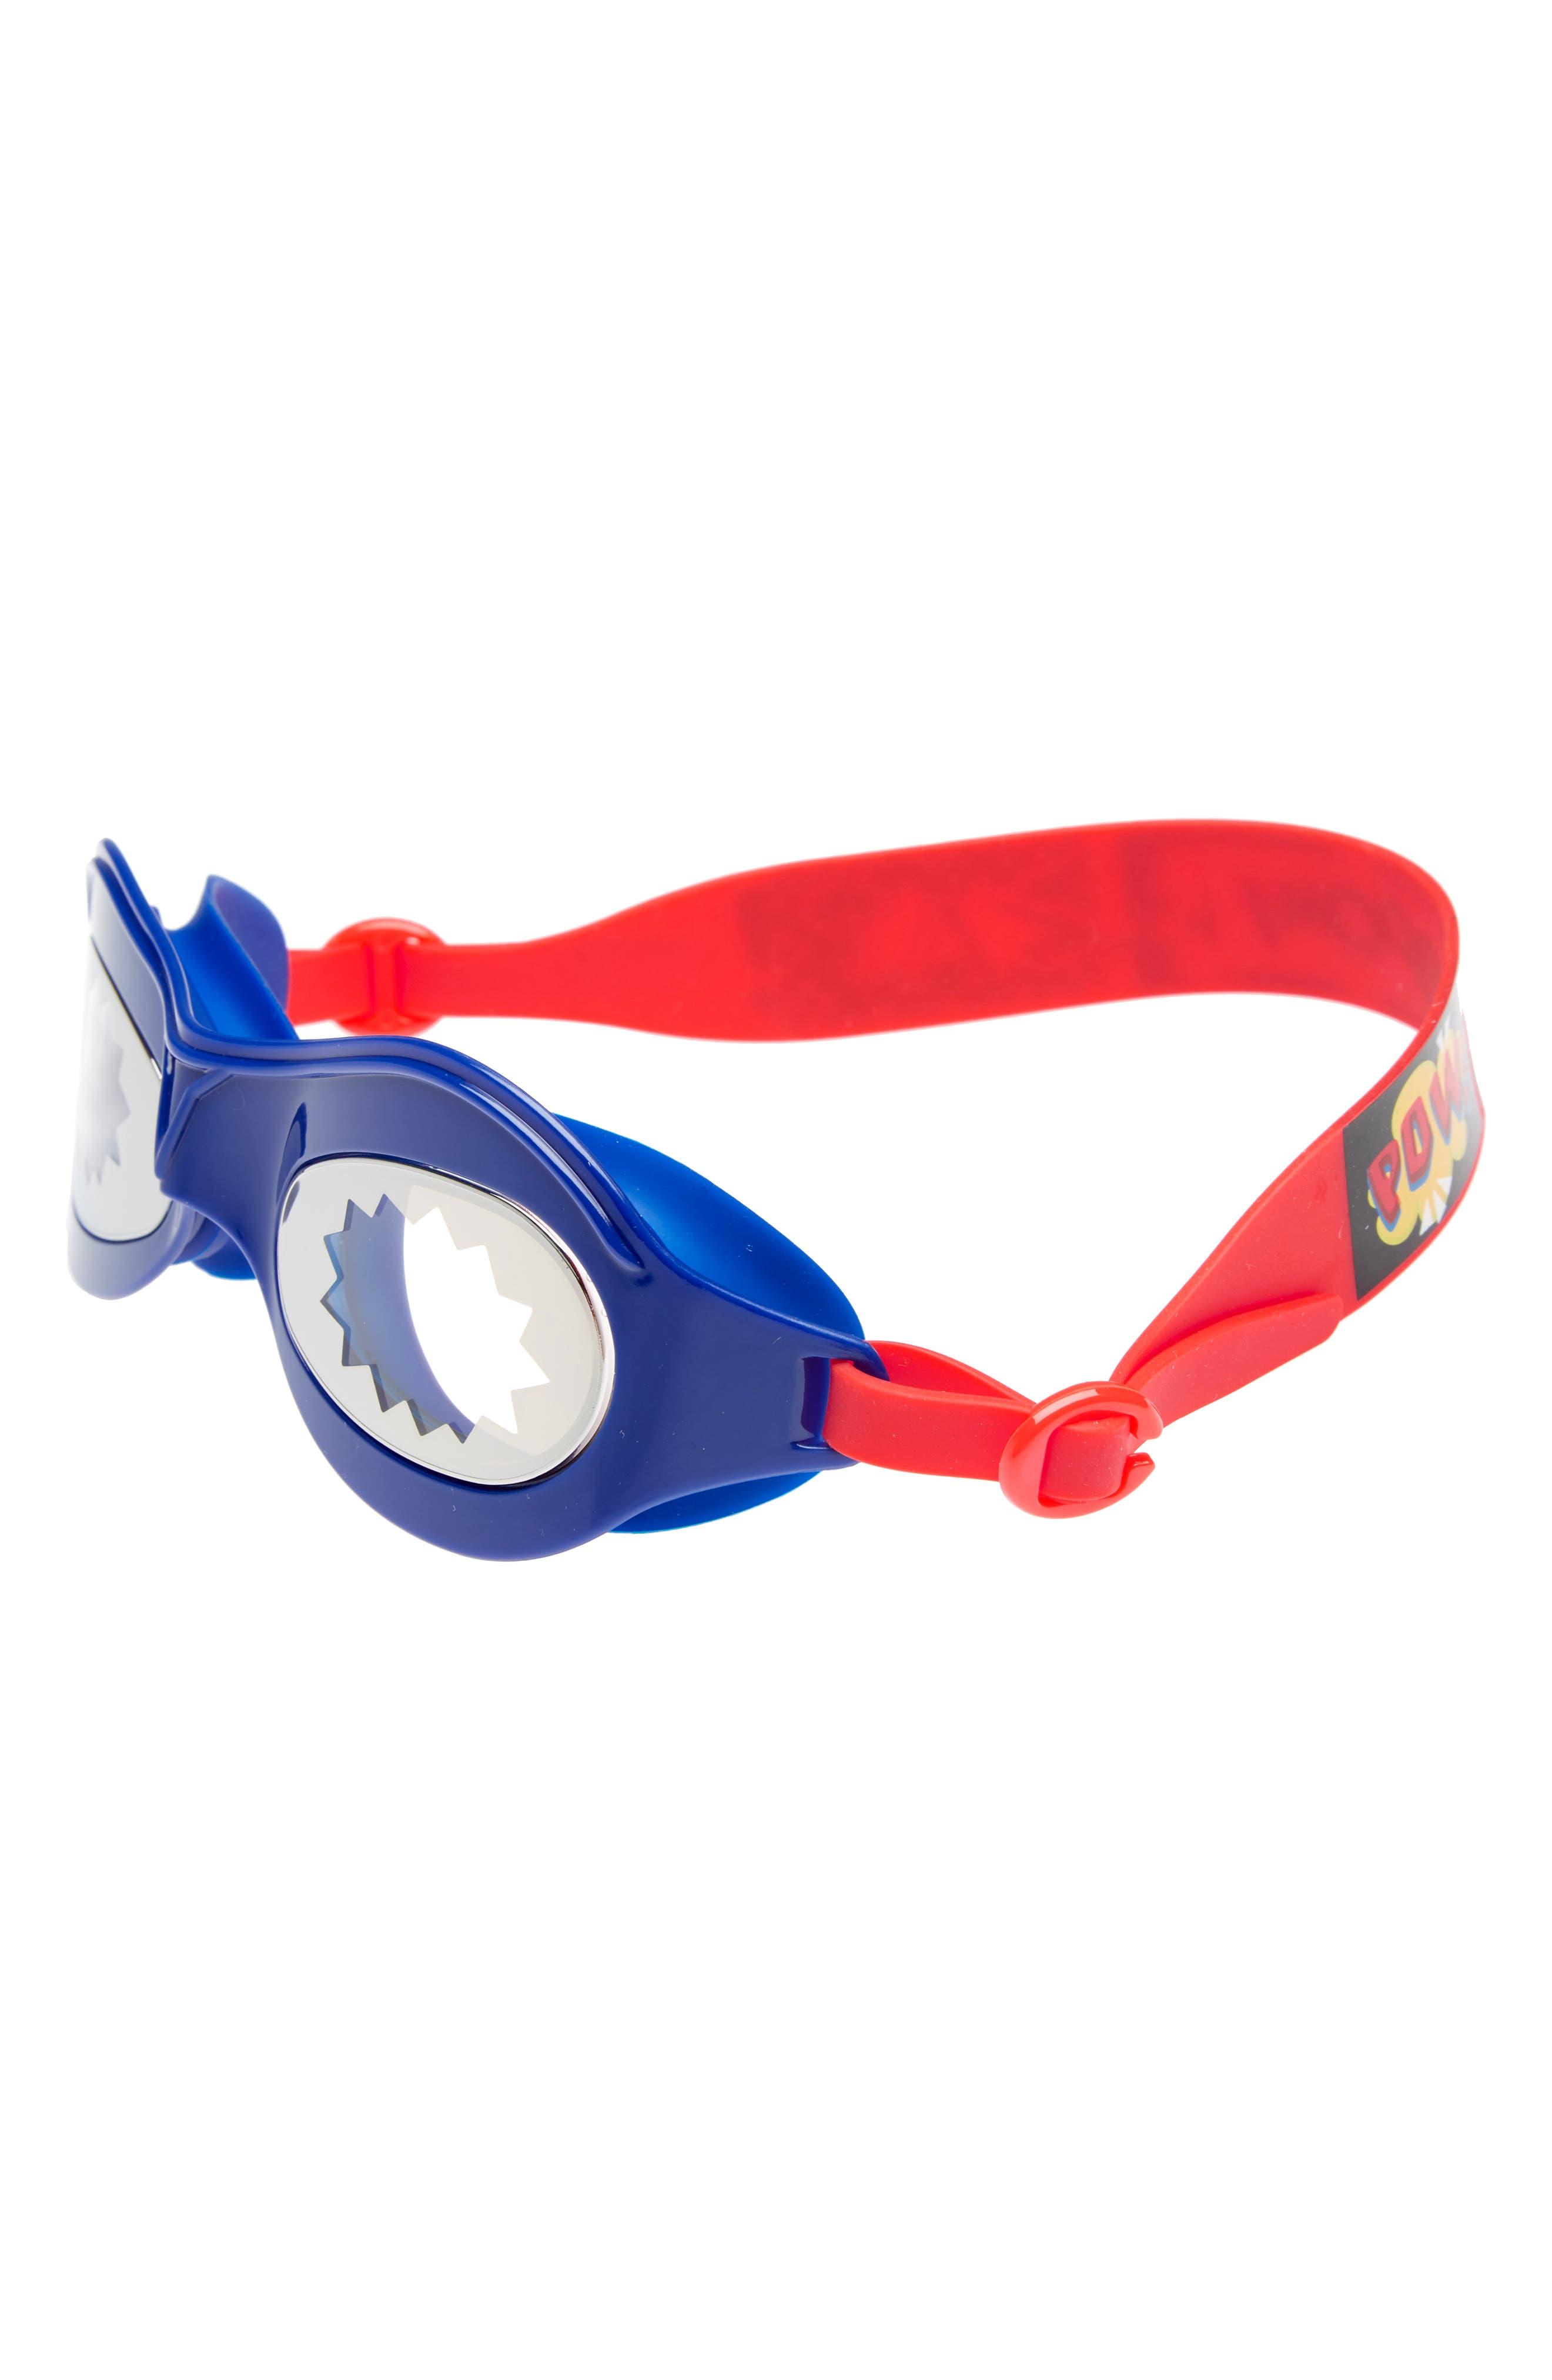 Atomic Comic Swim Goggles,                         Main,                         color, 400